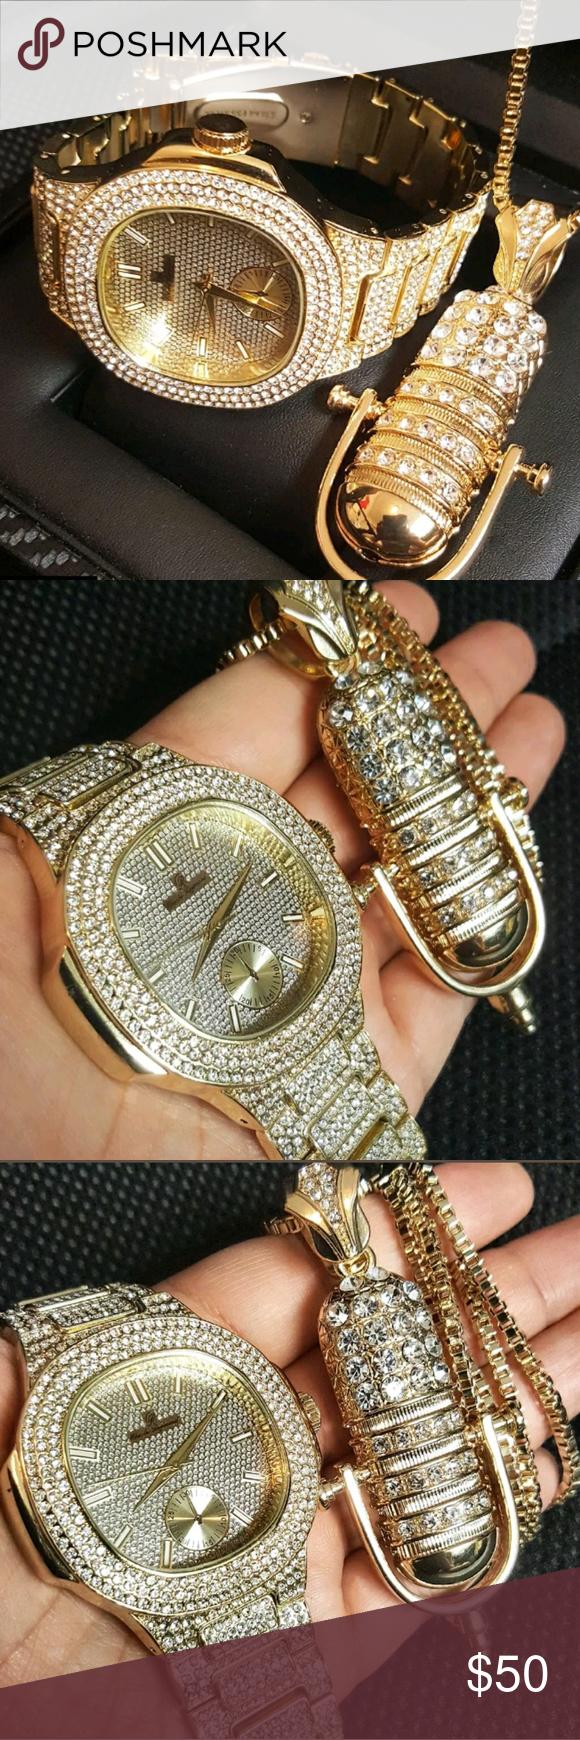 Menus lab diamond watch set men iced out hip hop watch u full iced